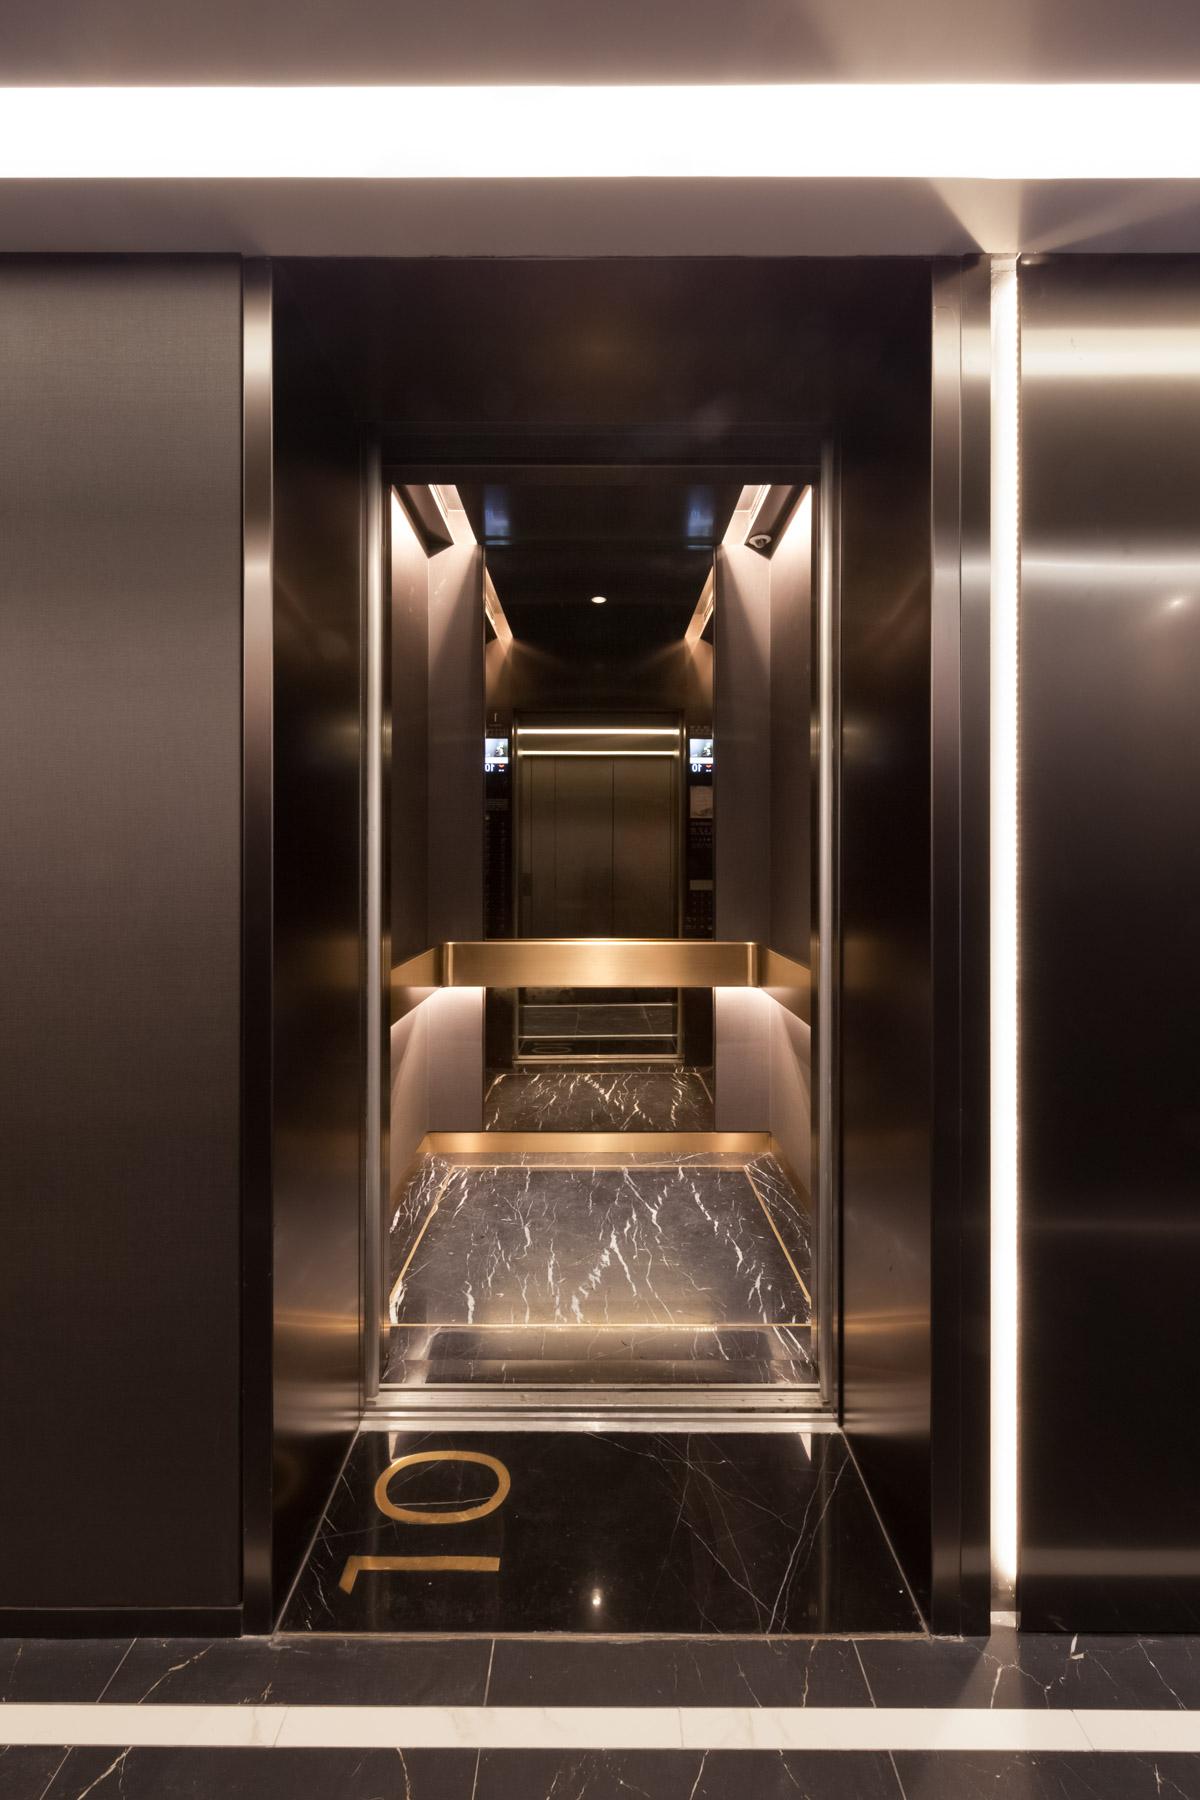 Luna_JM03_Lift Anahita Chouhan Architect Interior designer.jpg